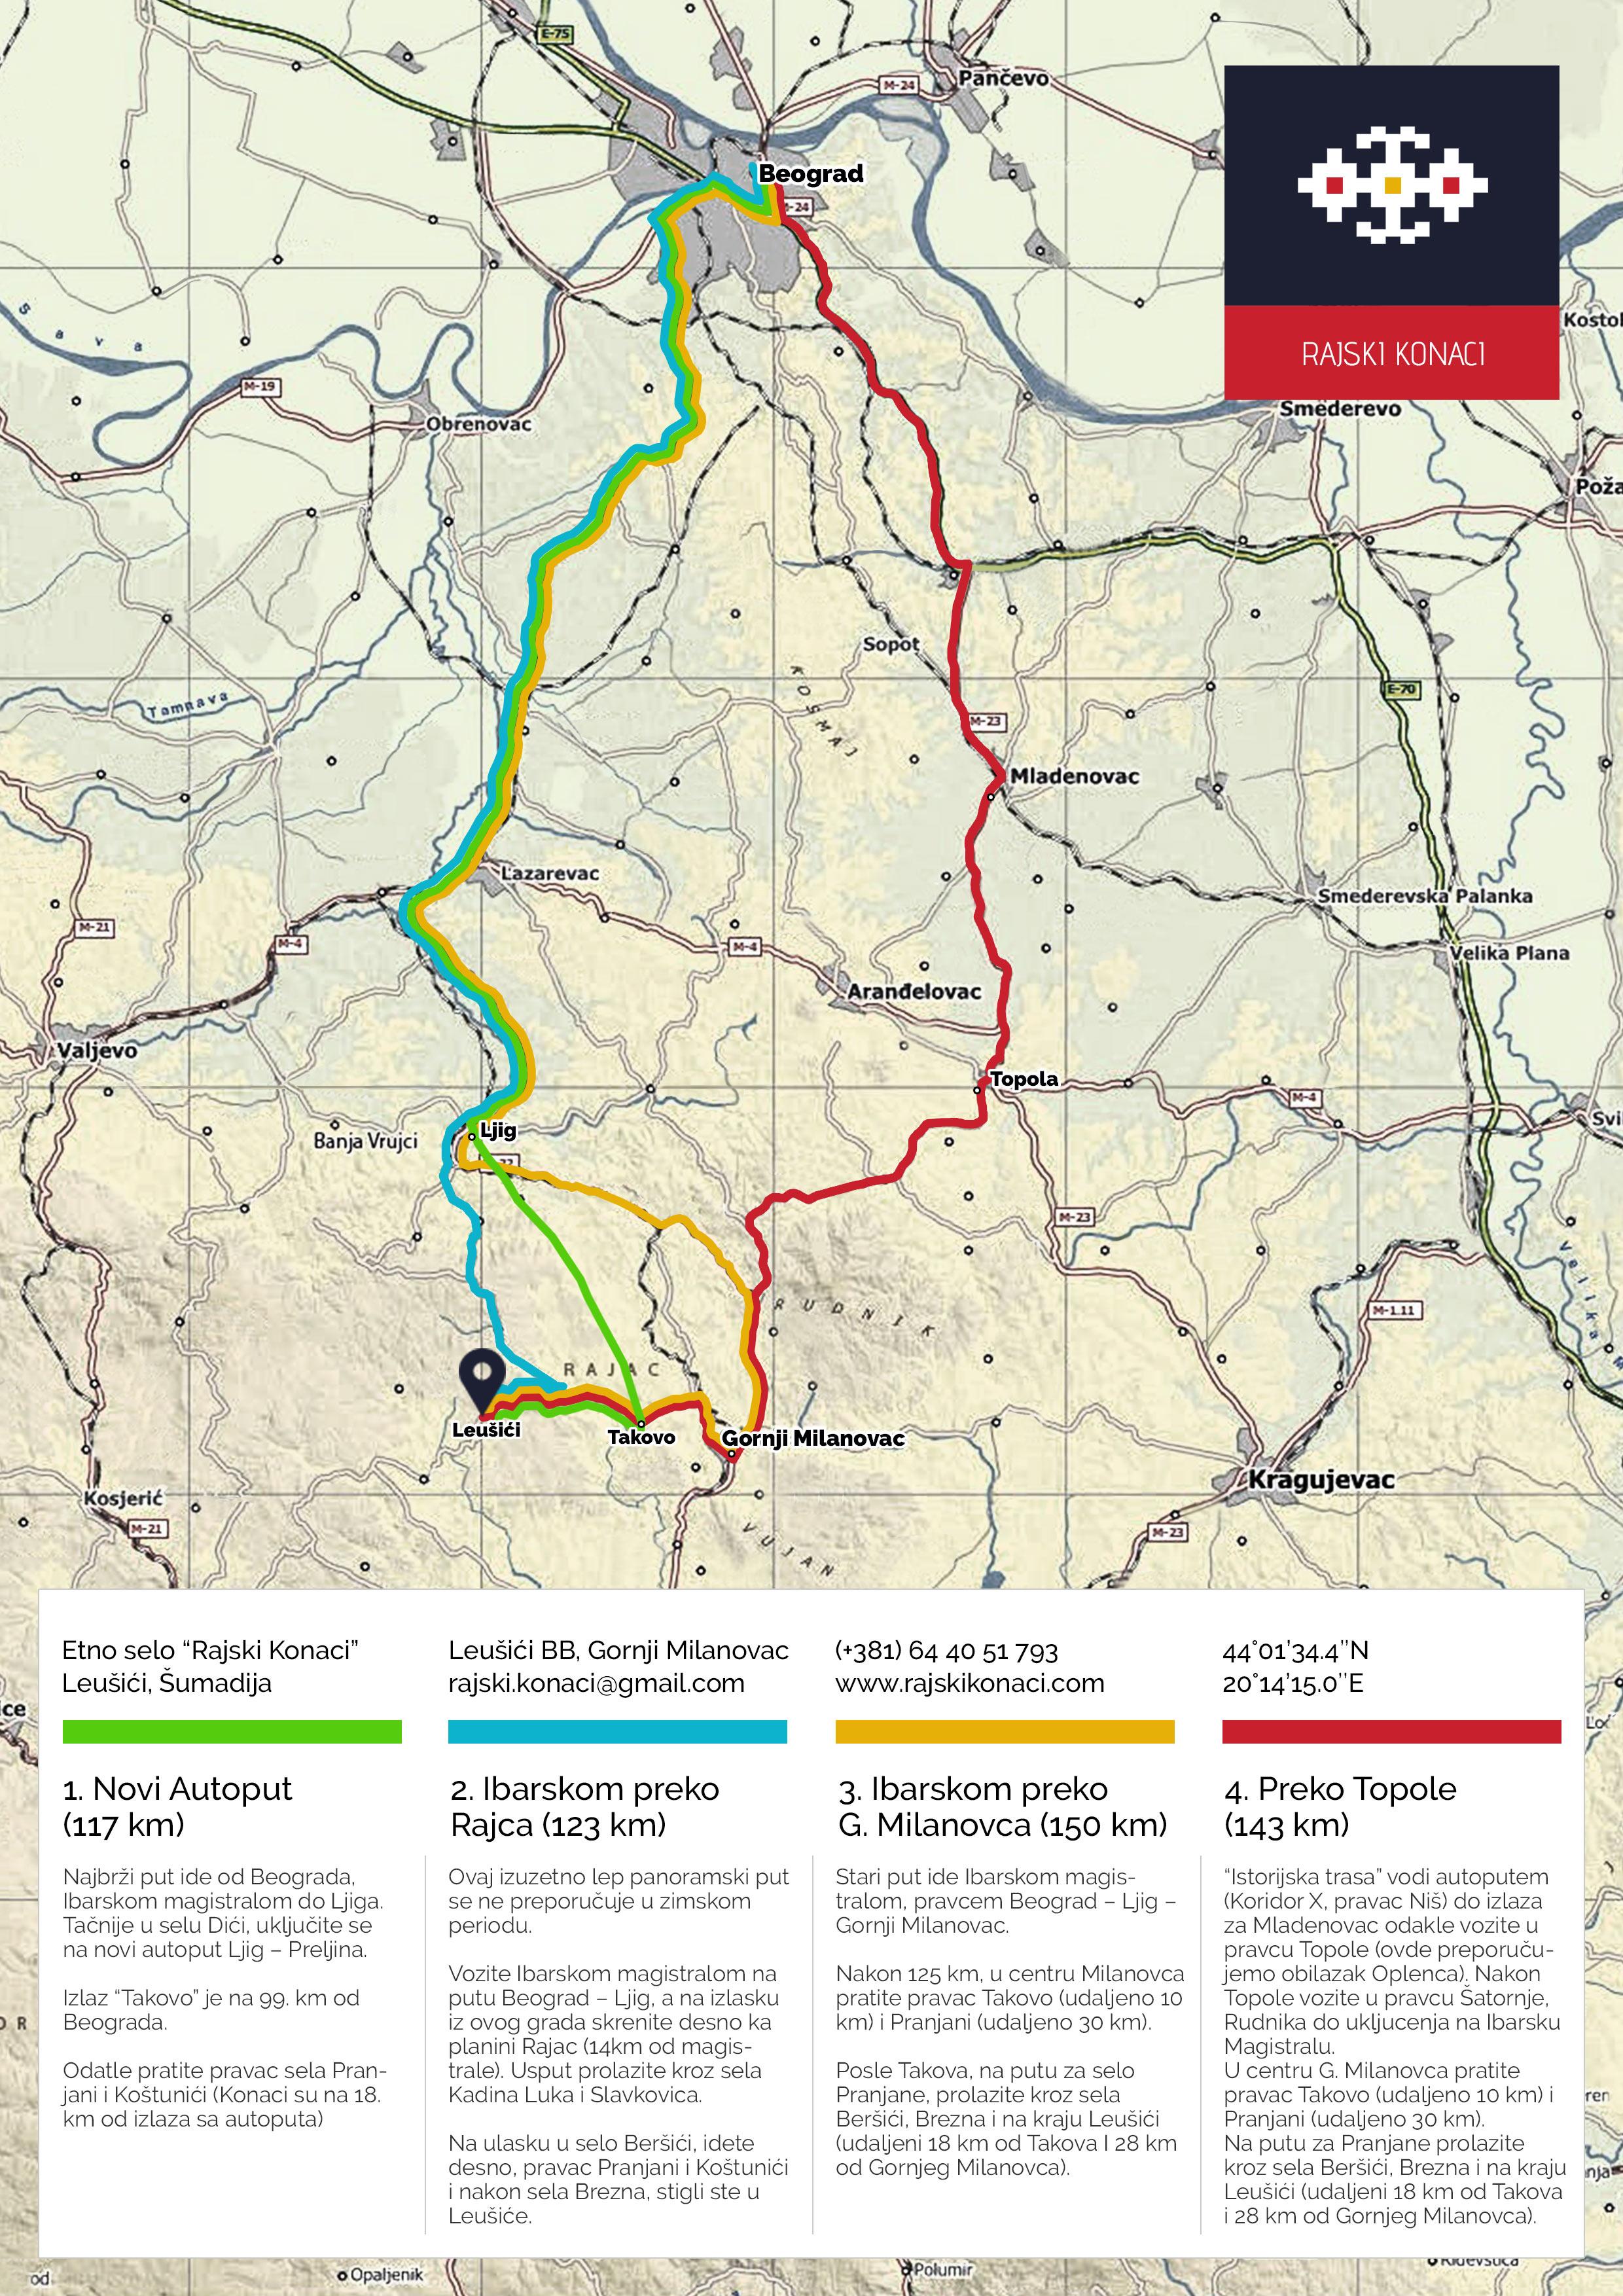 rajac mapa srbije Contact – Rajski konaci rajac mapa srbije